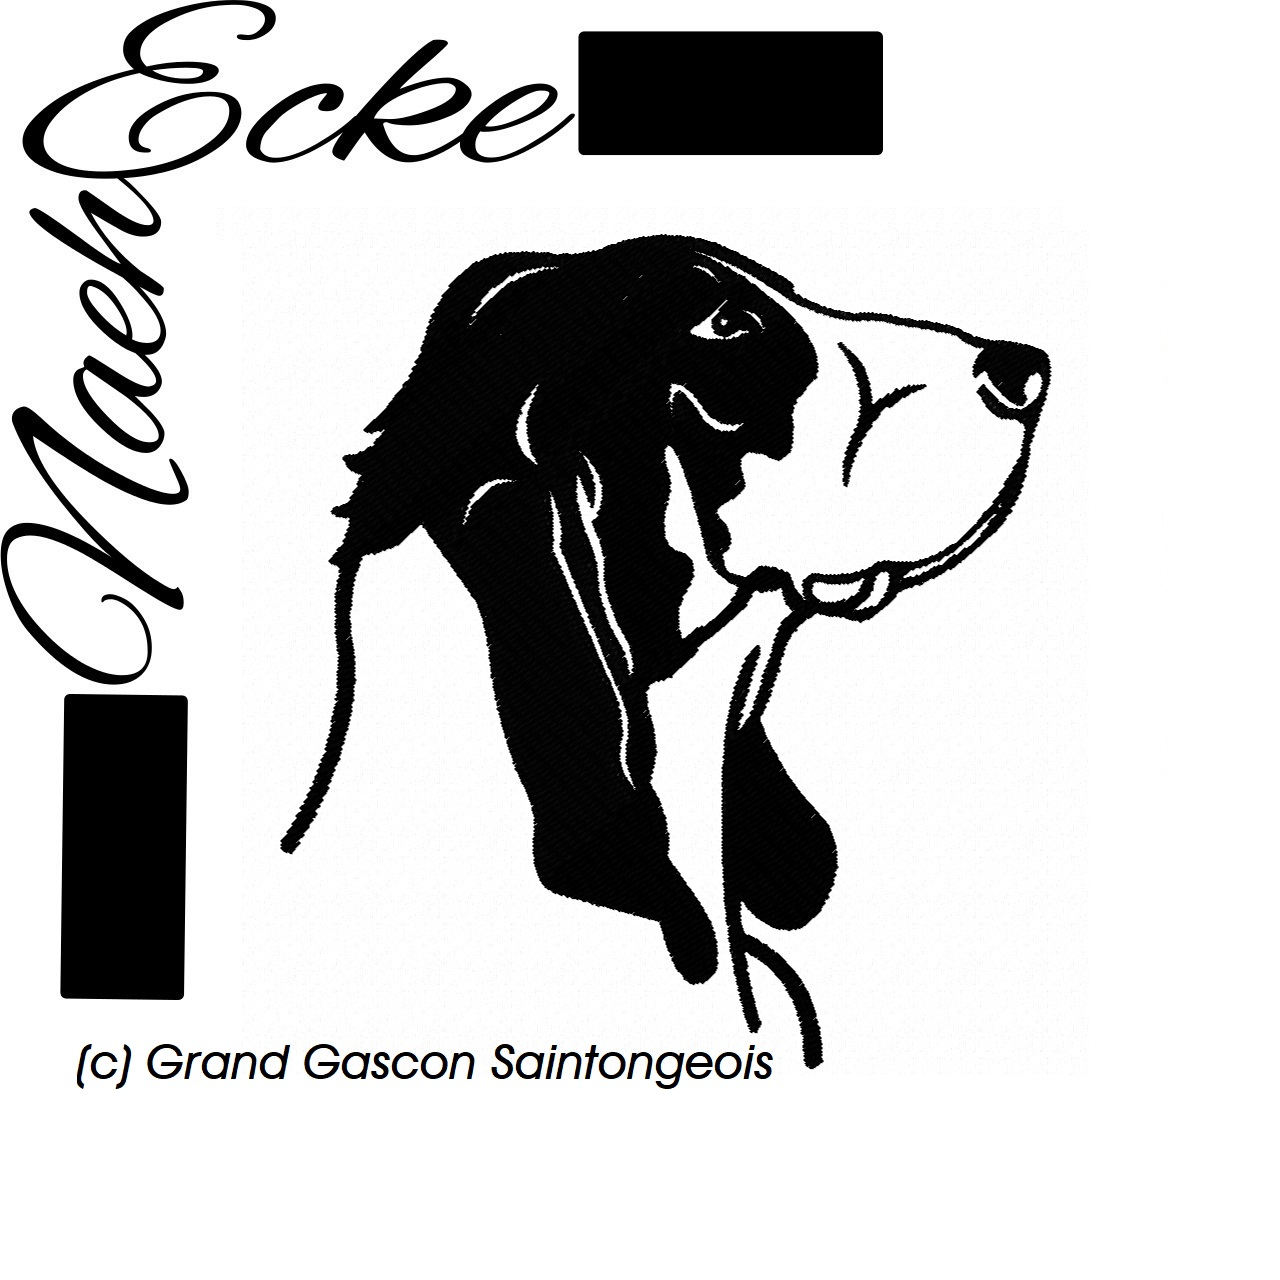 Grand Gascon Saintongeois